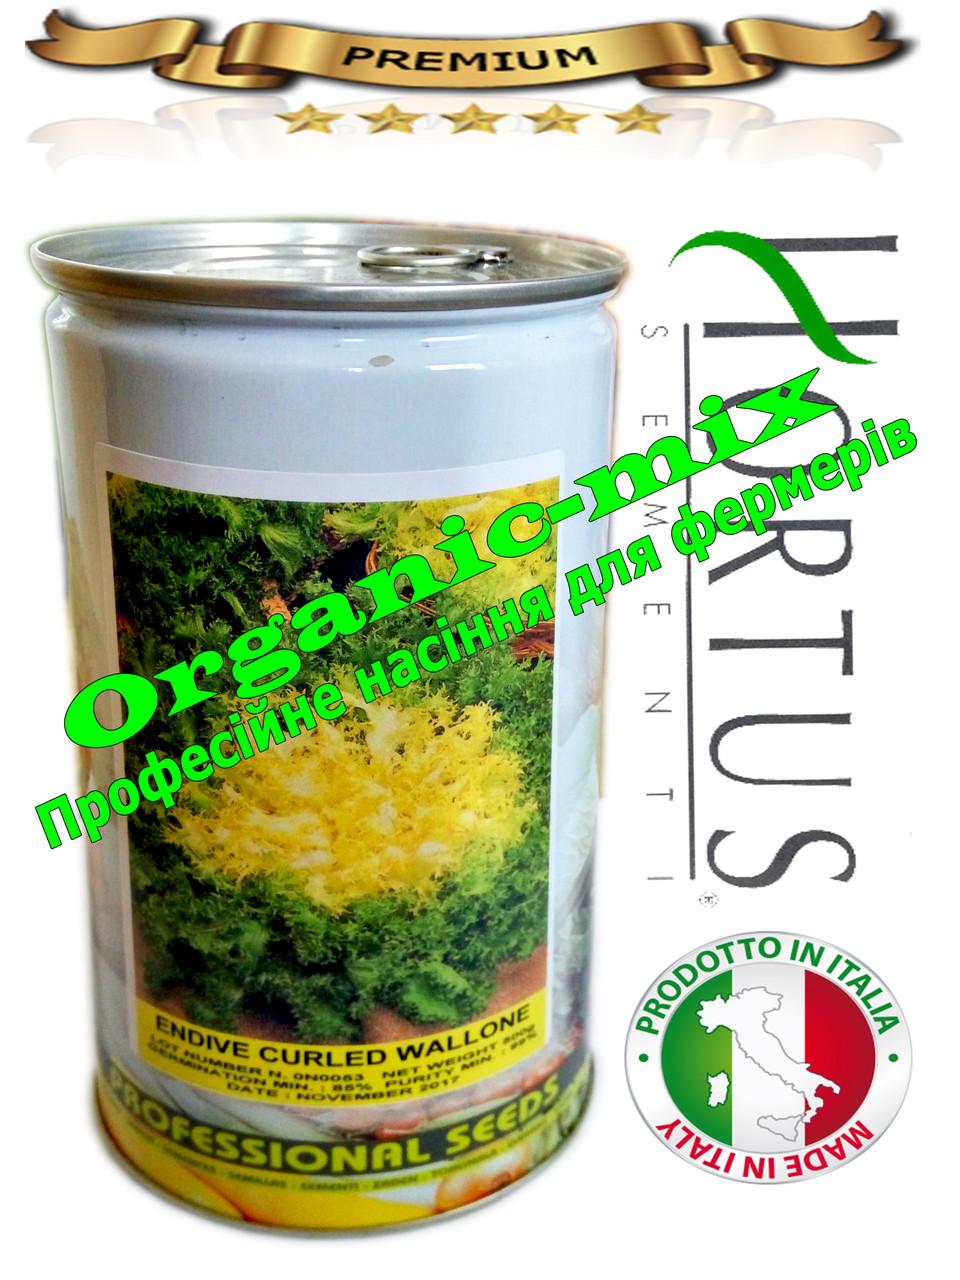 Салат Валоне (фризе,индивий) / ENDIVE CURLED WALLONE  (банка 500 грамм) Hortus Италия